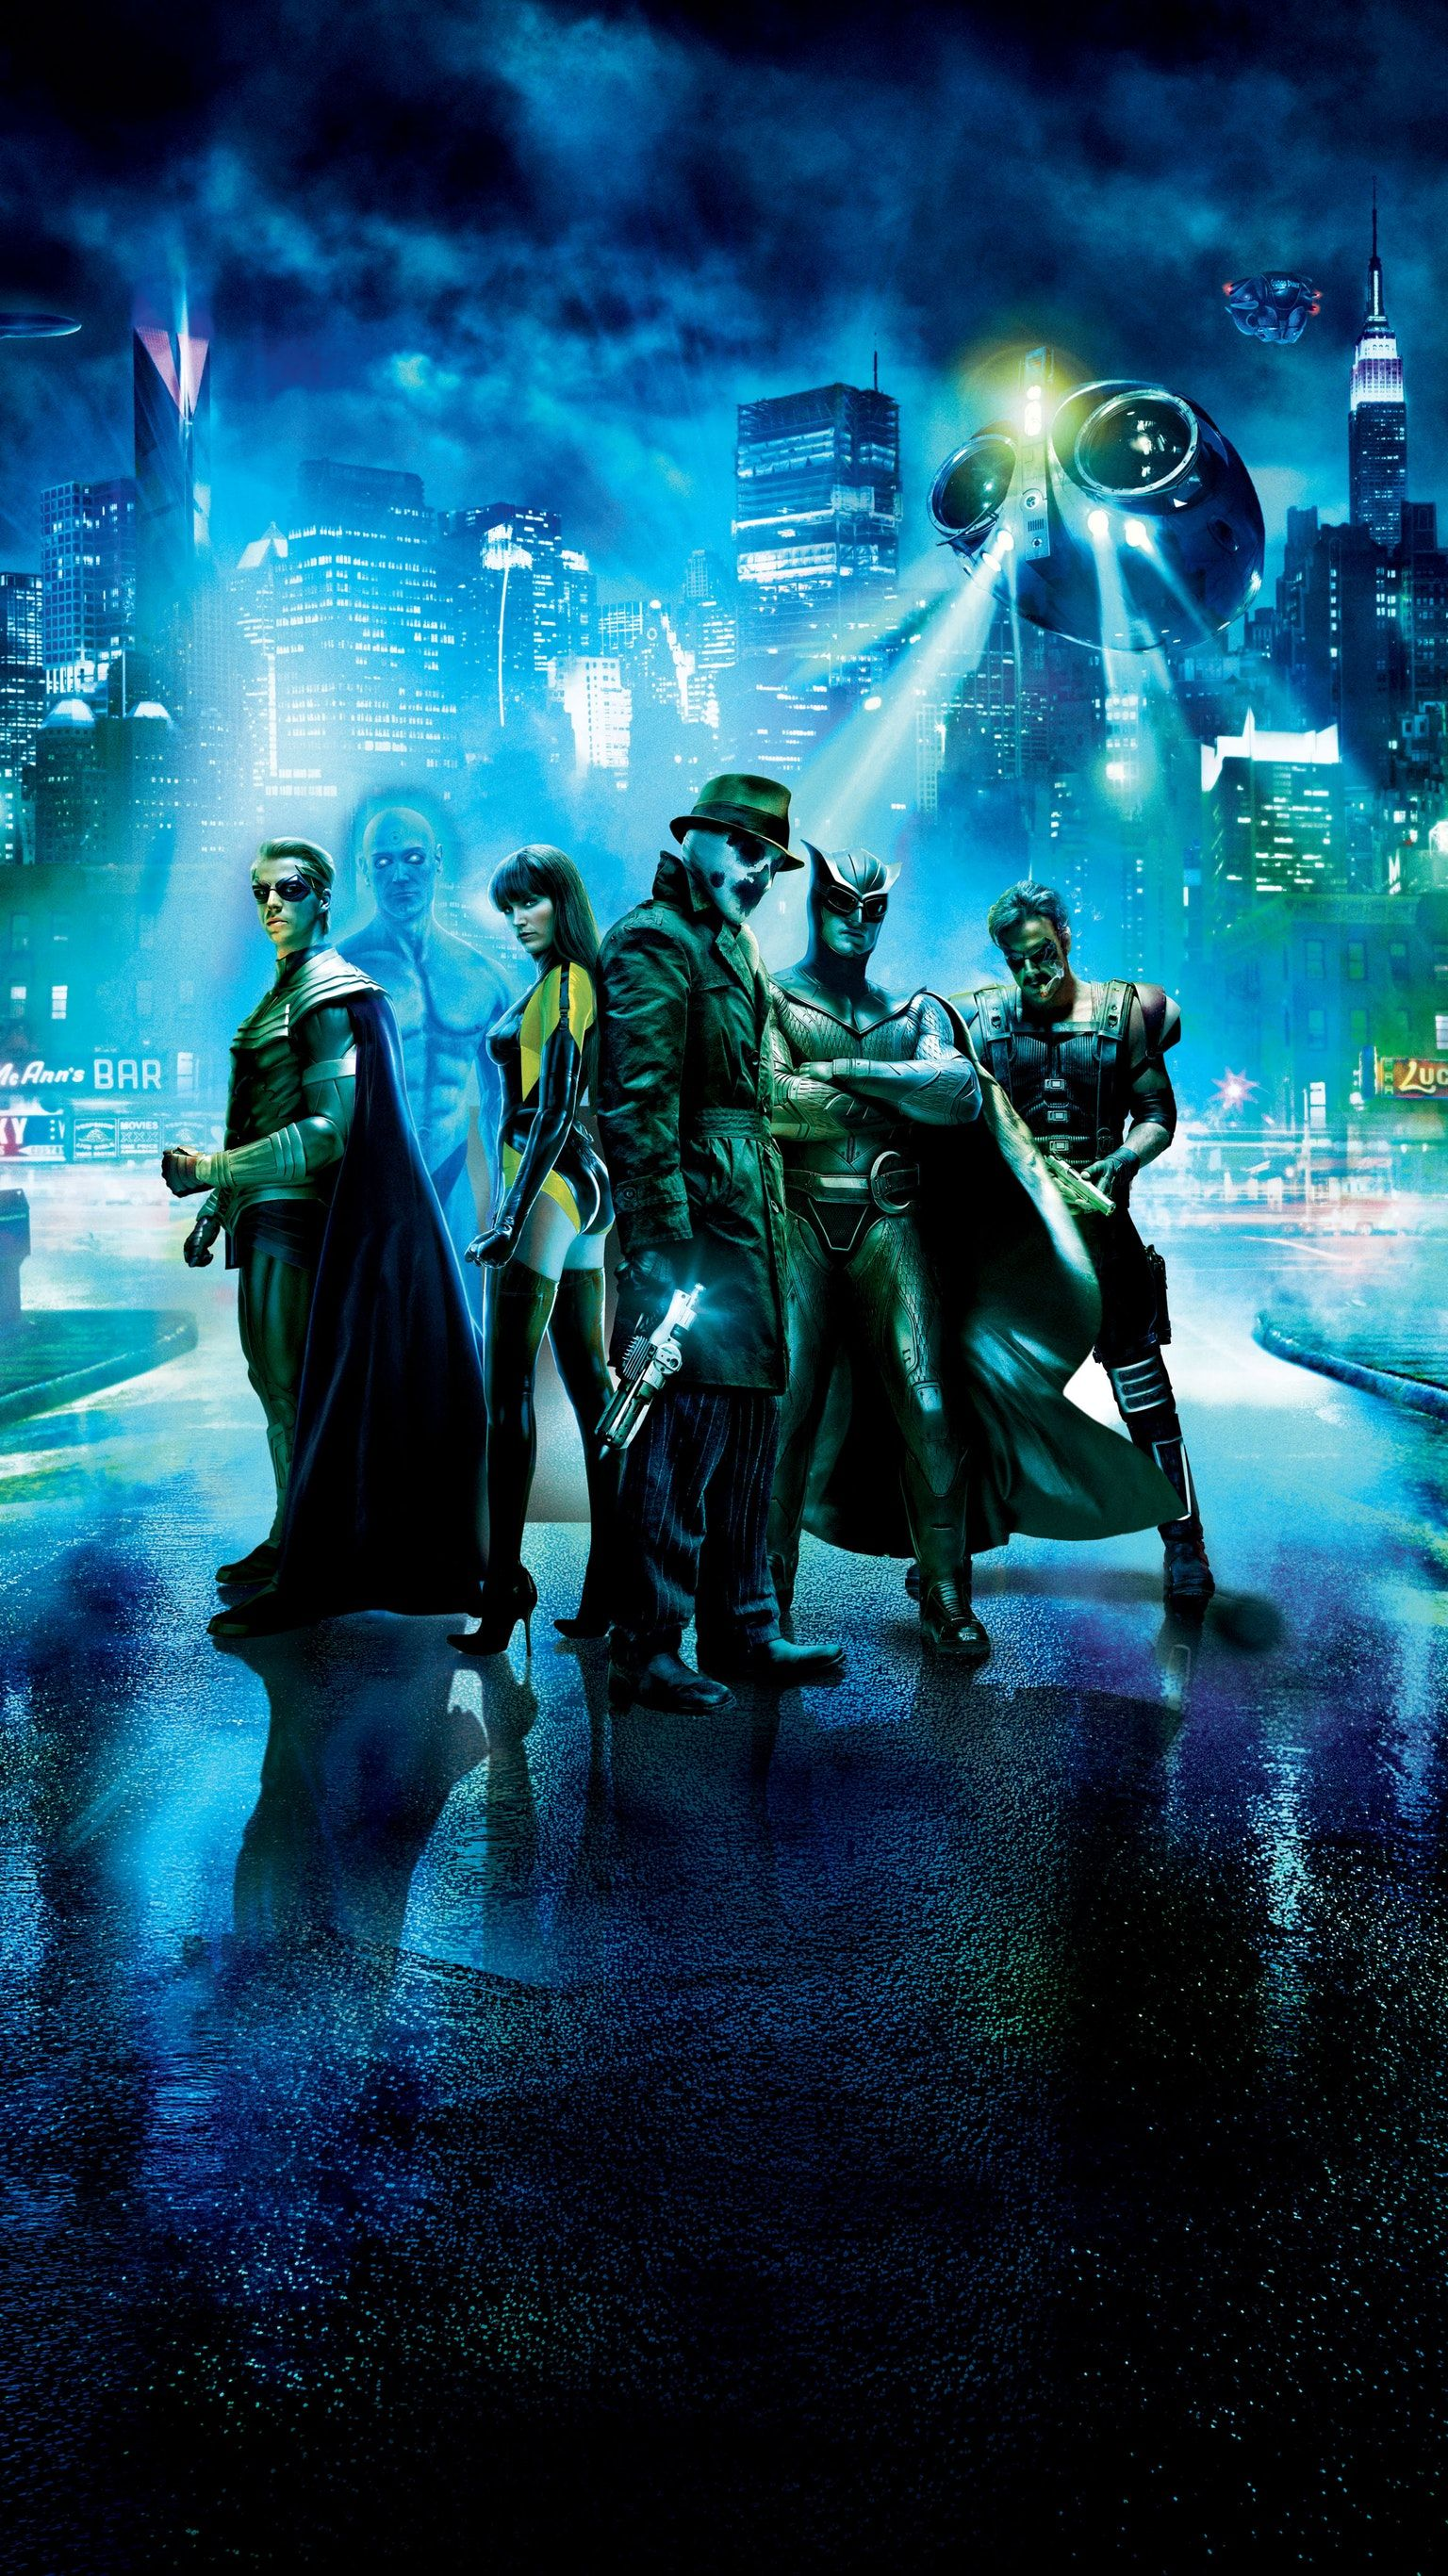 Watchmen 2009 Phone Wallpaper Moviemania In 2020 Superhero Movies Watchmen Silk Spectre